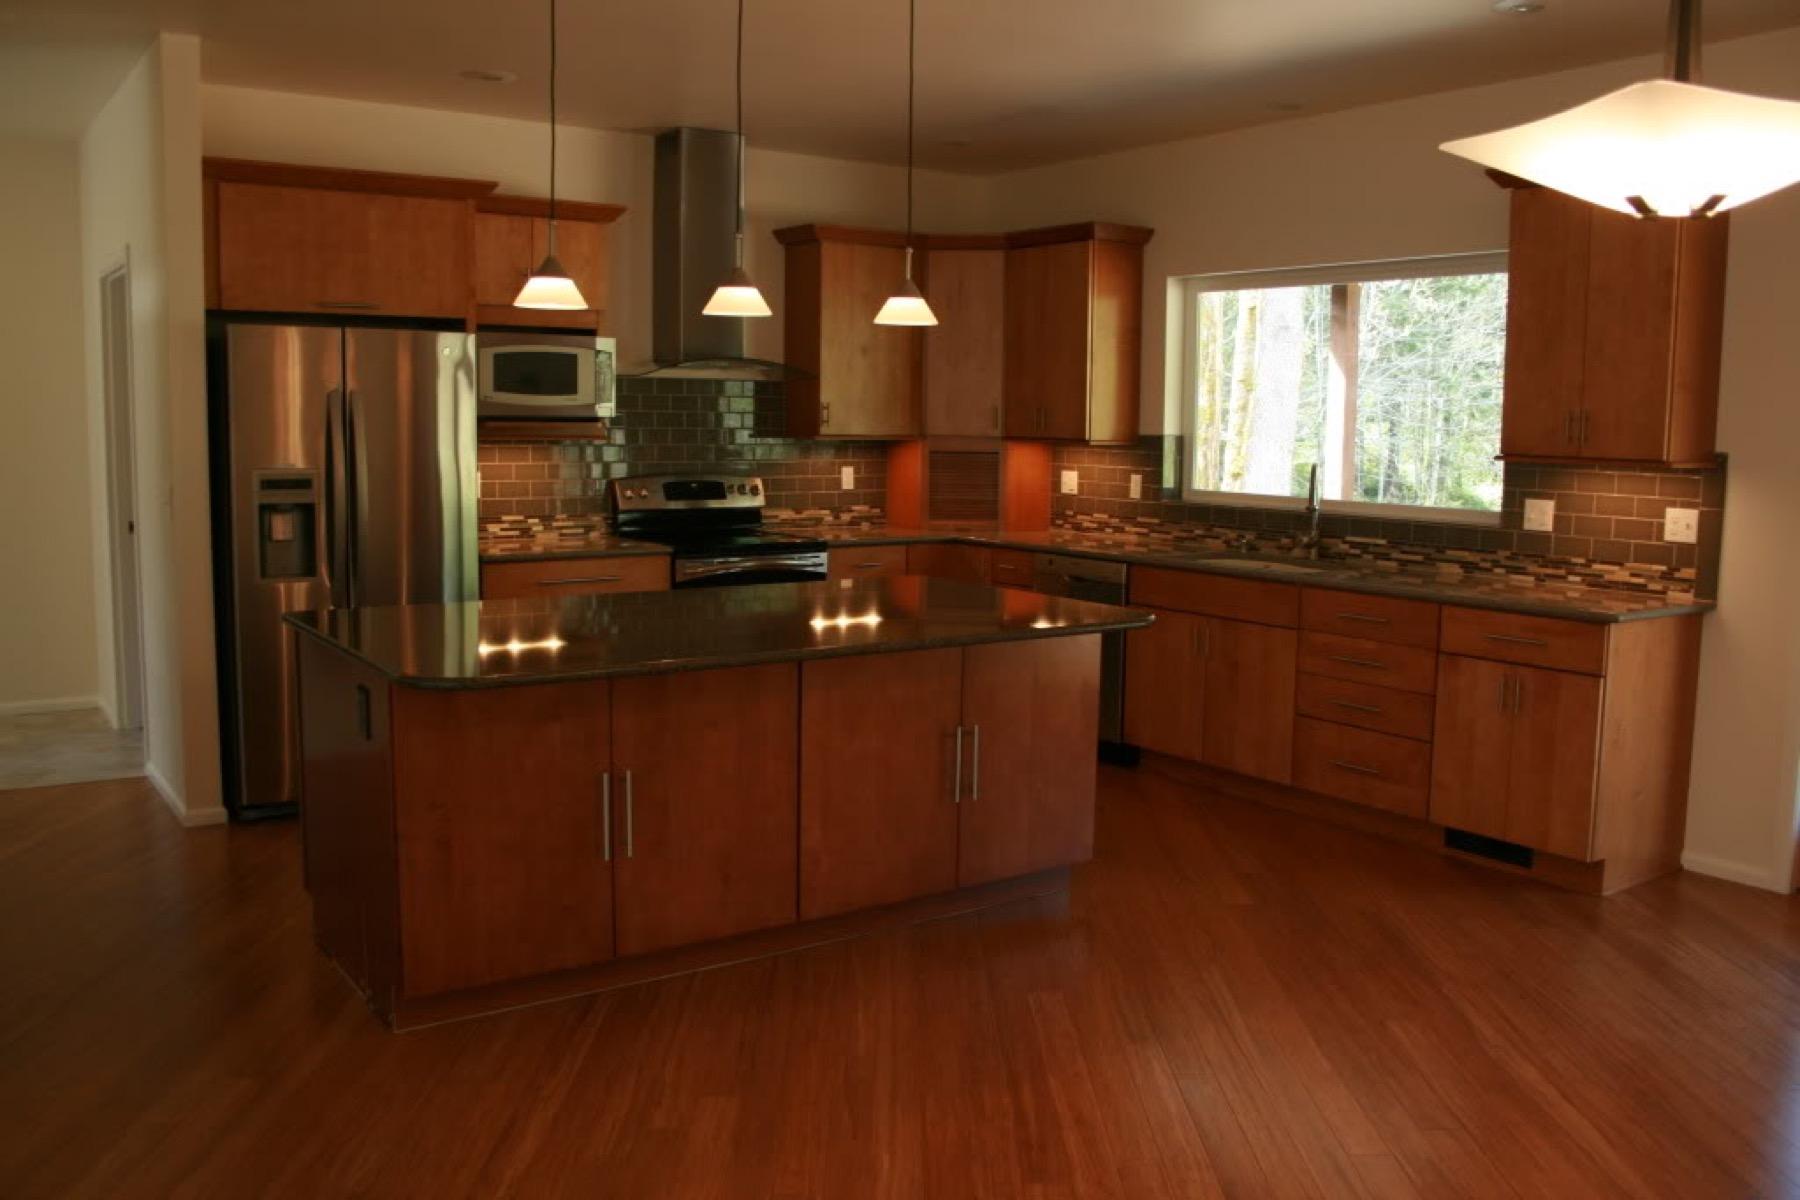 Kelley_Home_Services_Gig_Harbor_Home_Construction_26.jpg